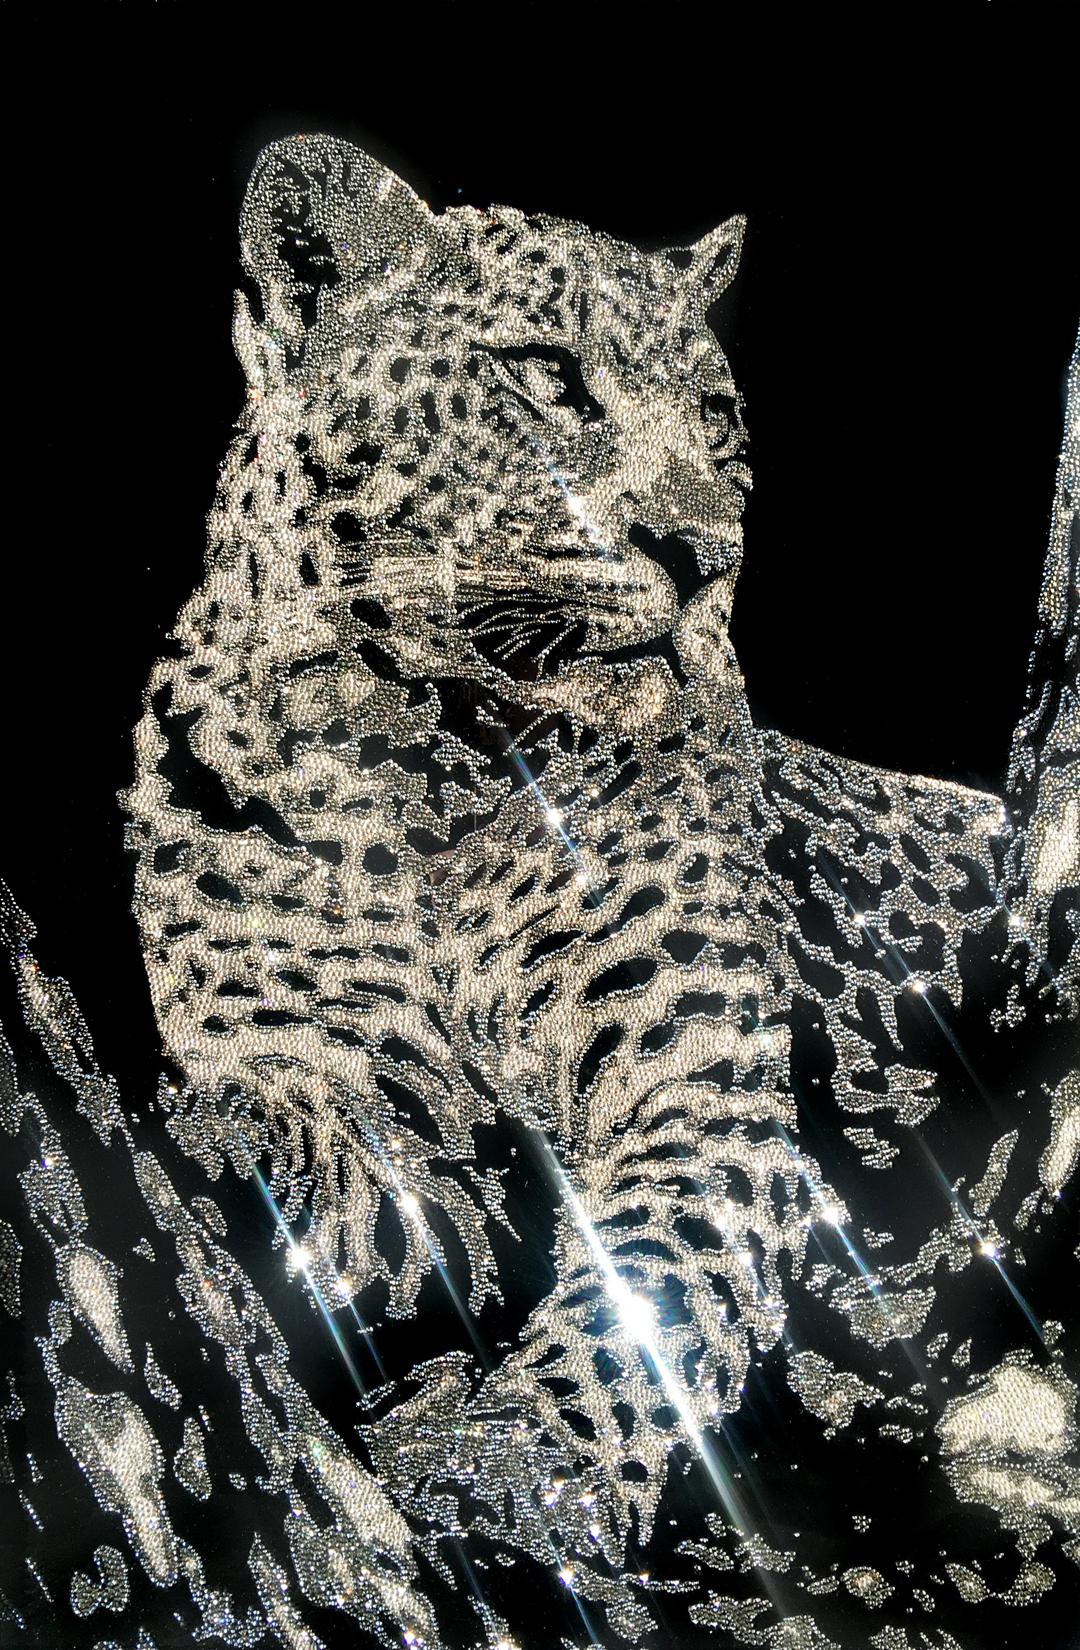 Obsession, 37400 Crystals from Swarovski® su plexiglass, 105x70 cm. 2017